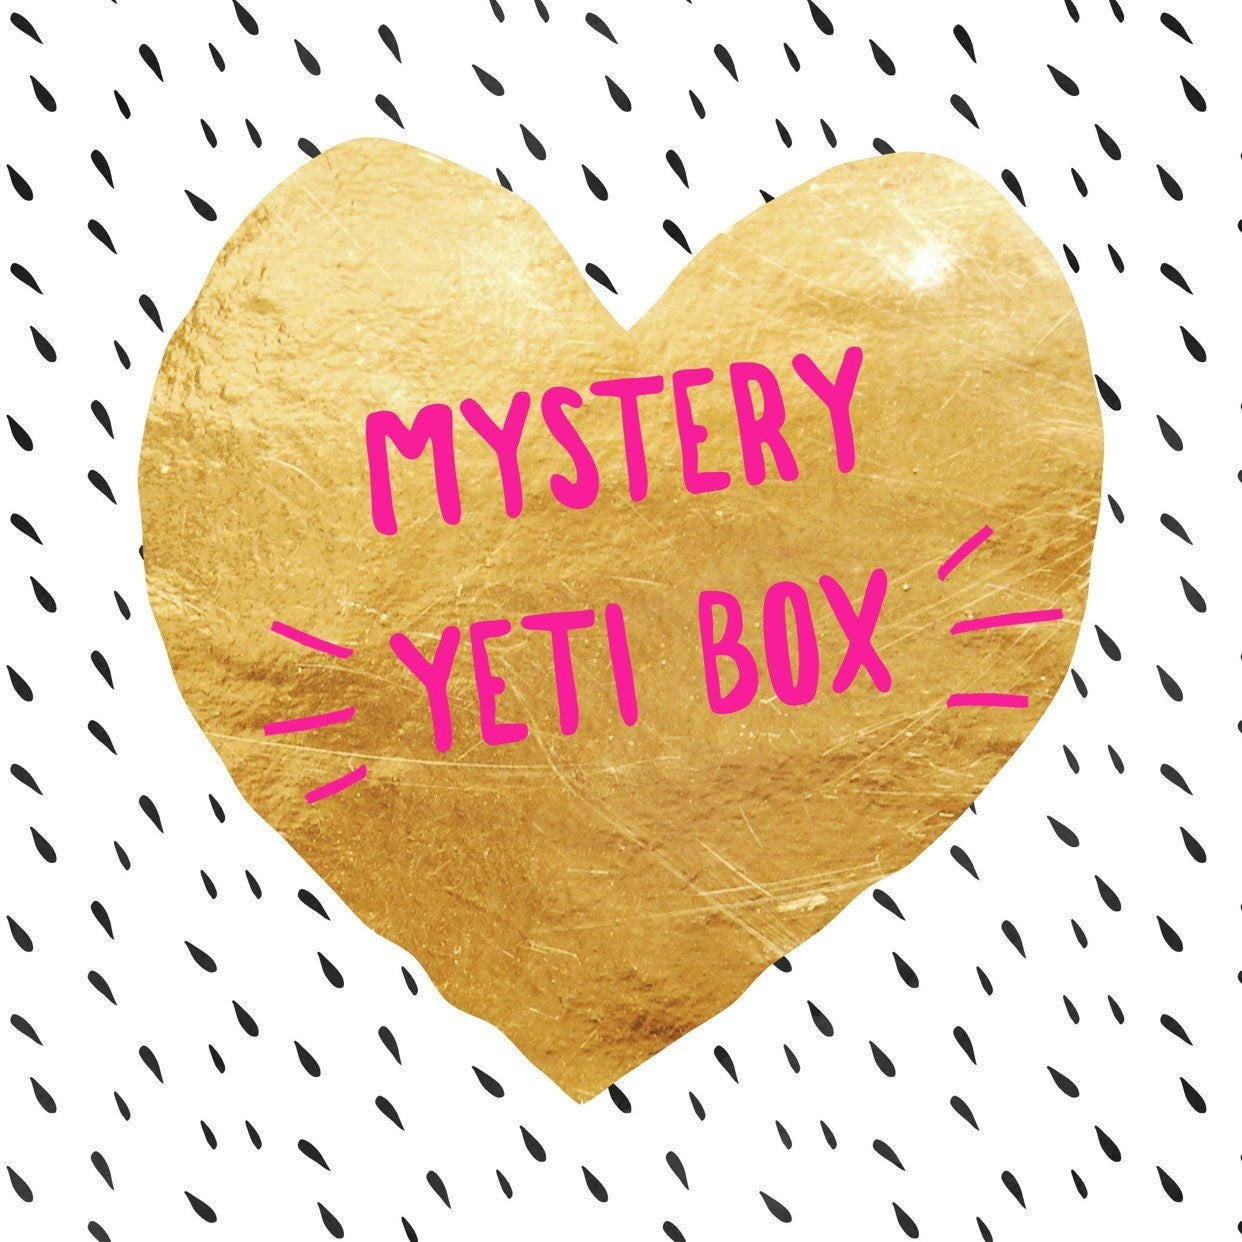 Mystery Yeti Box